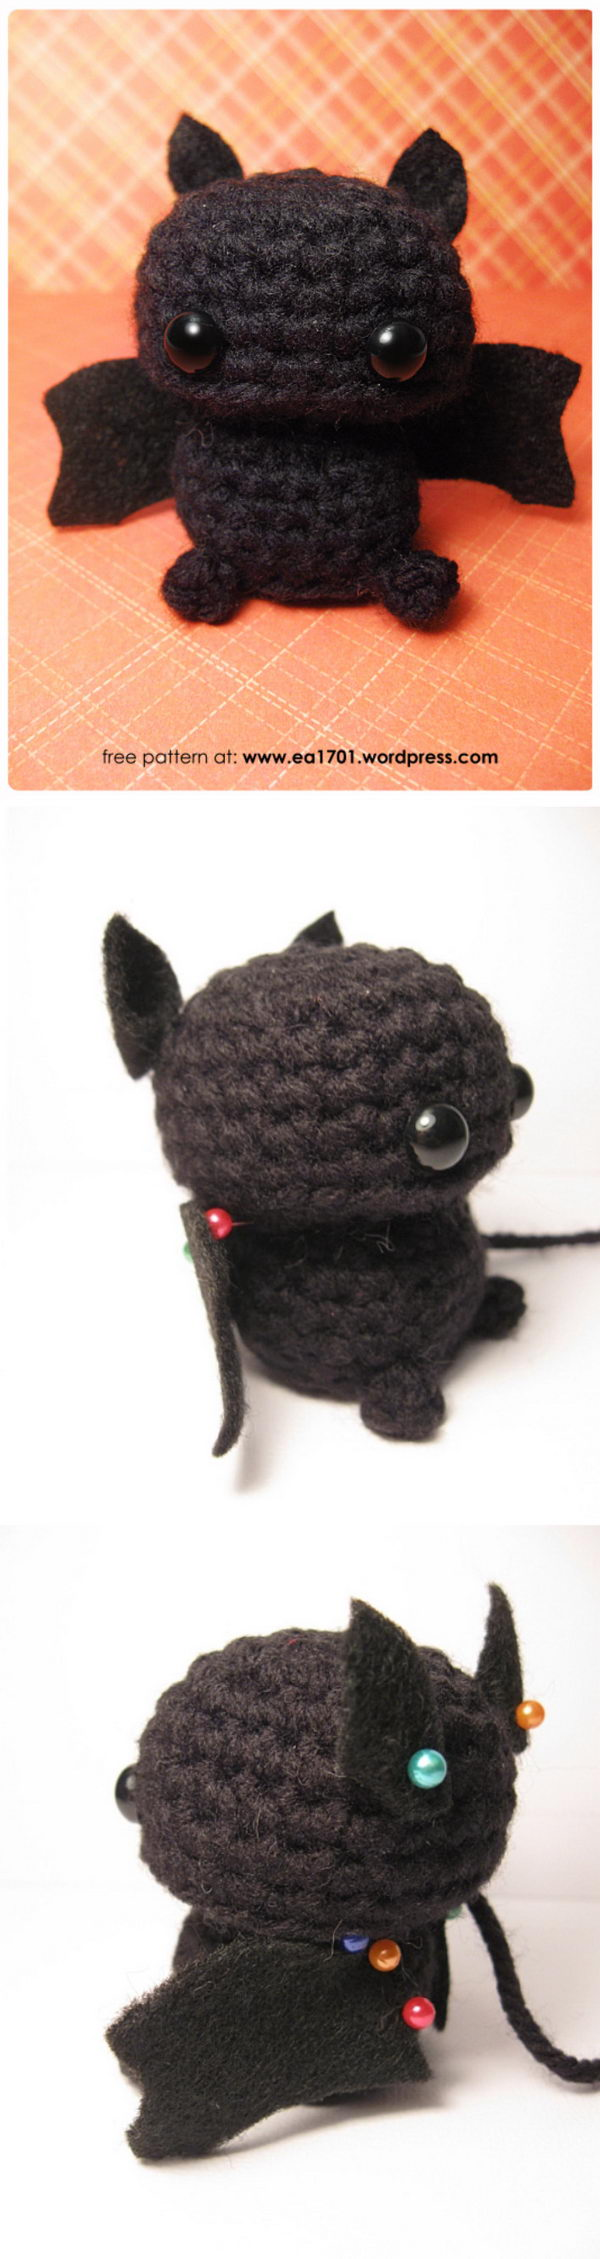 Crochet Bitty Bat.